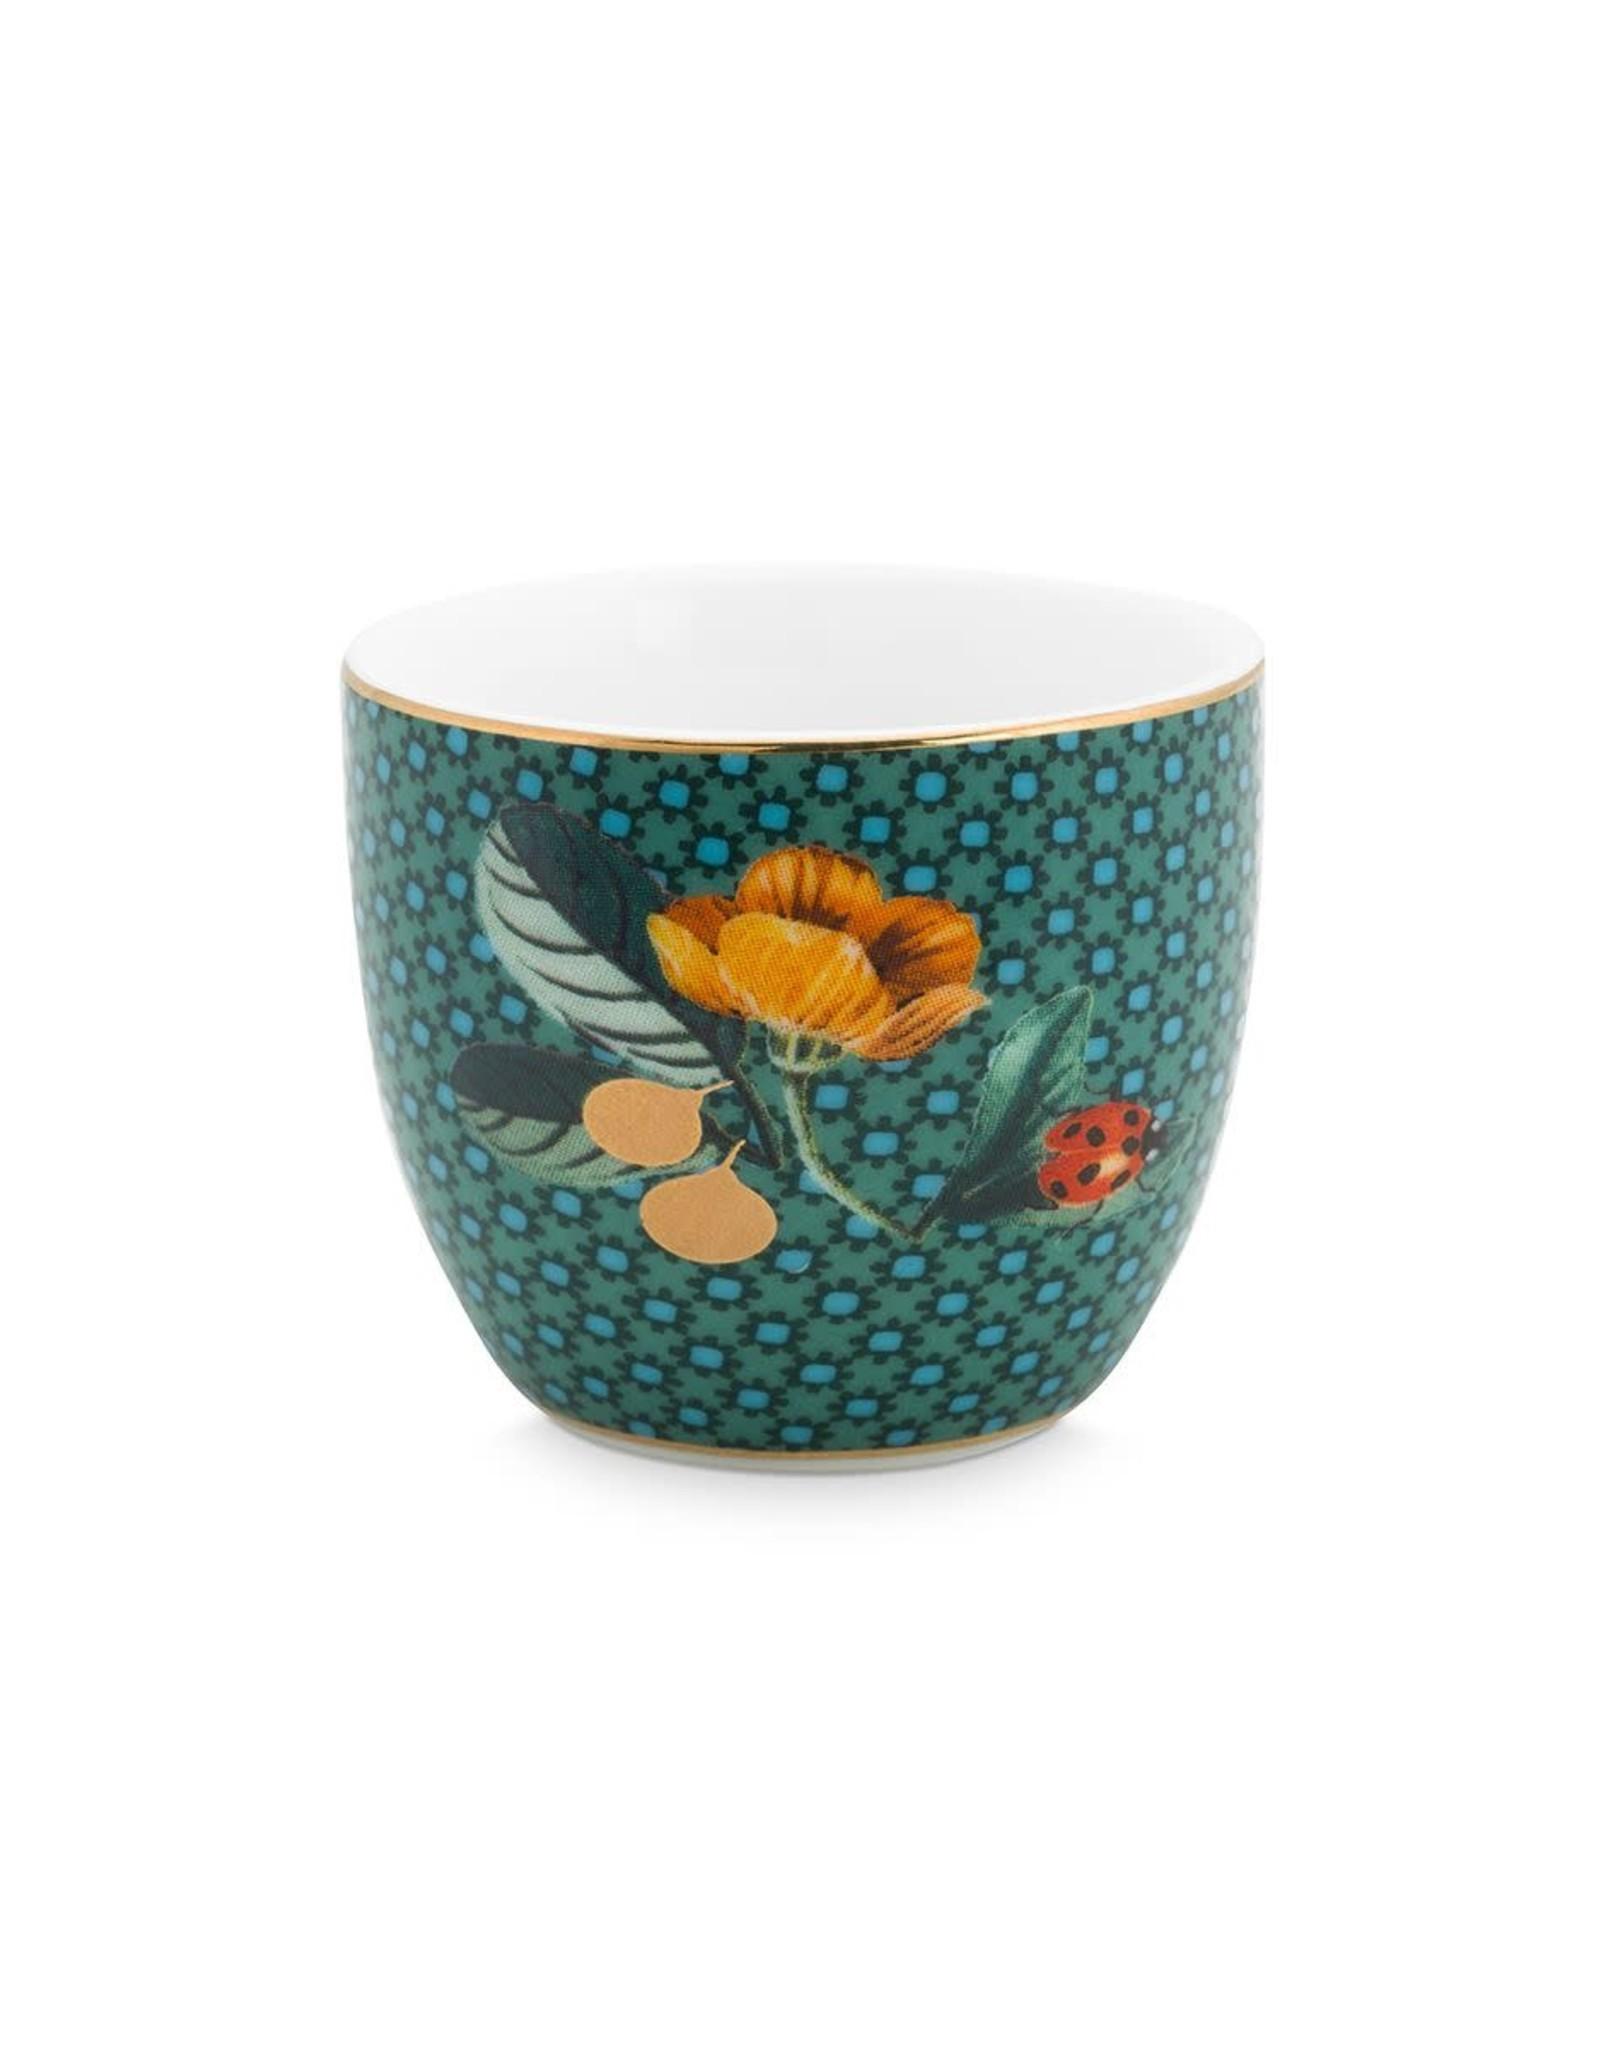 pip-studio Pip-Studio. Egg Cup Winter Wonderland Ladybug Green